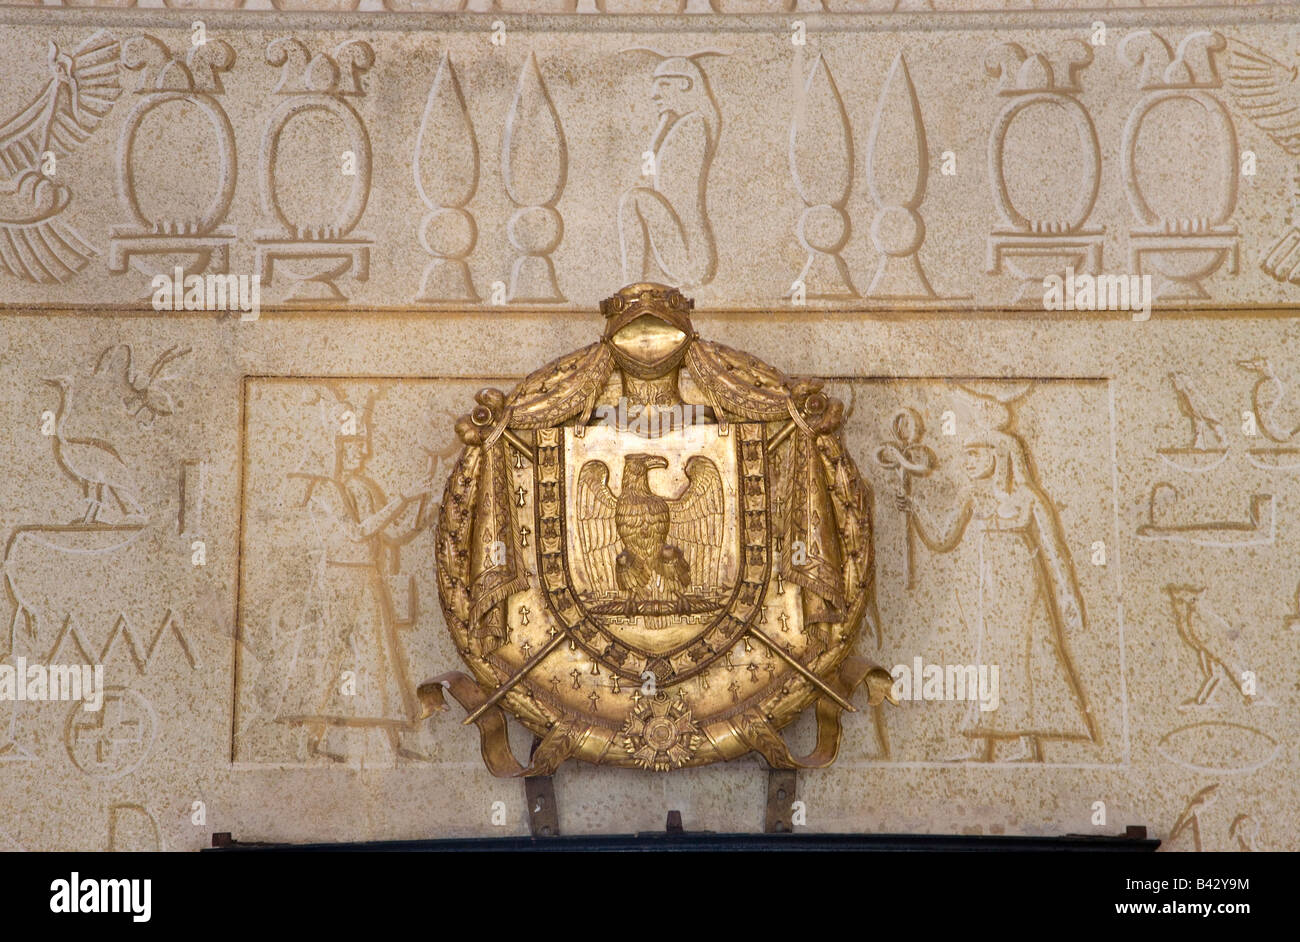 Egyptian symbols on villa of san martino on the island of elba in egyptian symbols on villa of san martino on the island of elba in the tuscan archipelago of italy europe where napoleon buycottarizona Image collections